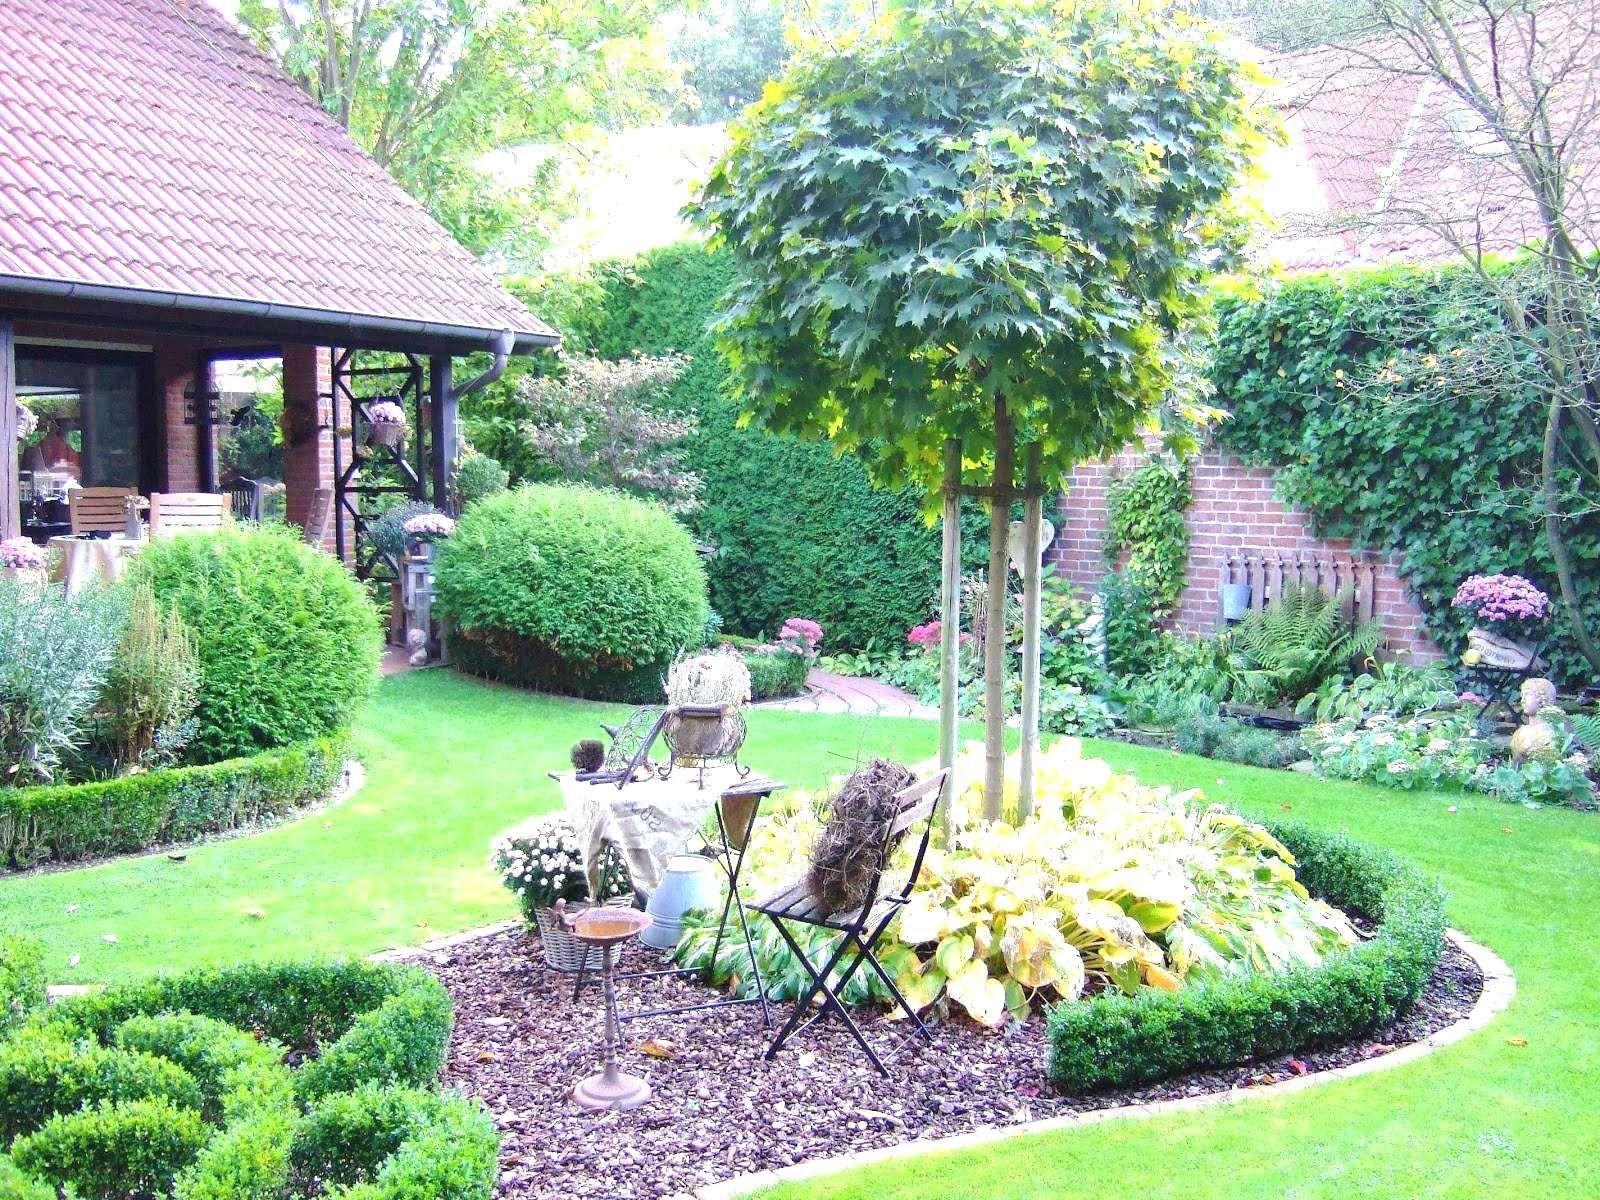 Mediterraner Garten Elegant Garten Ideas Garten Anlegen Inspirational Aussenleuchten